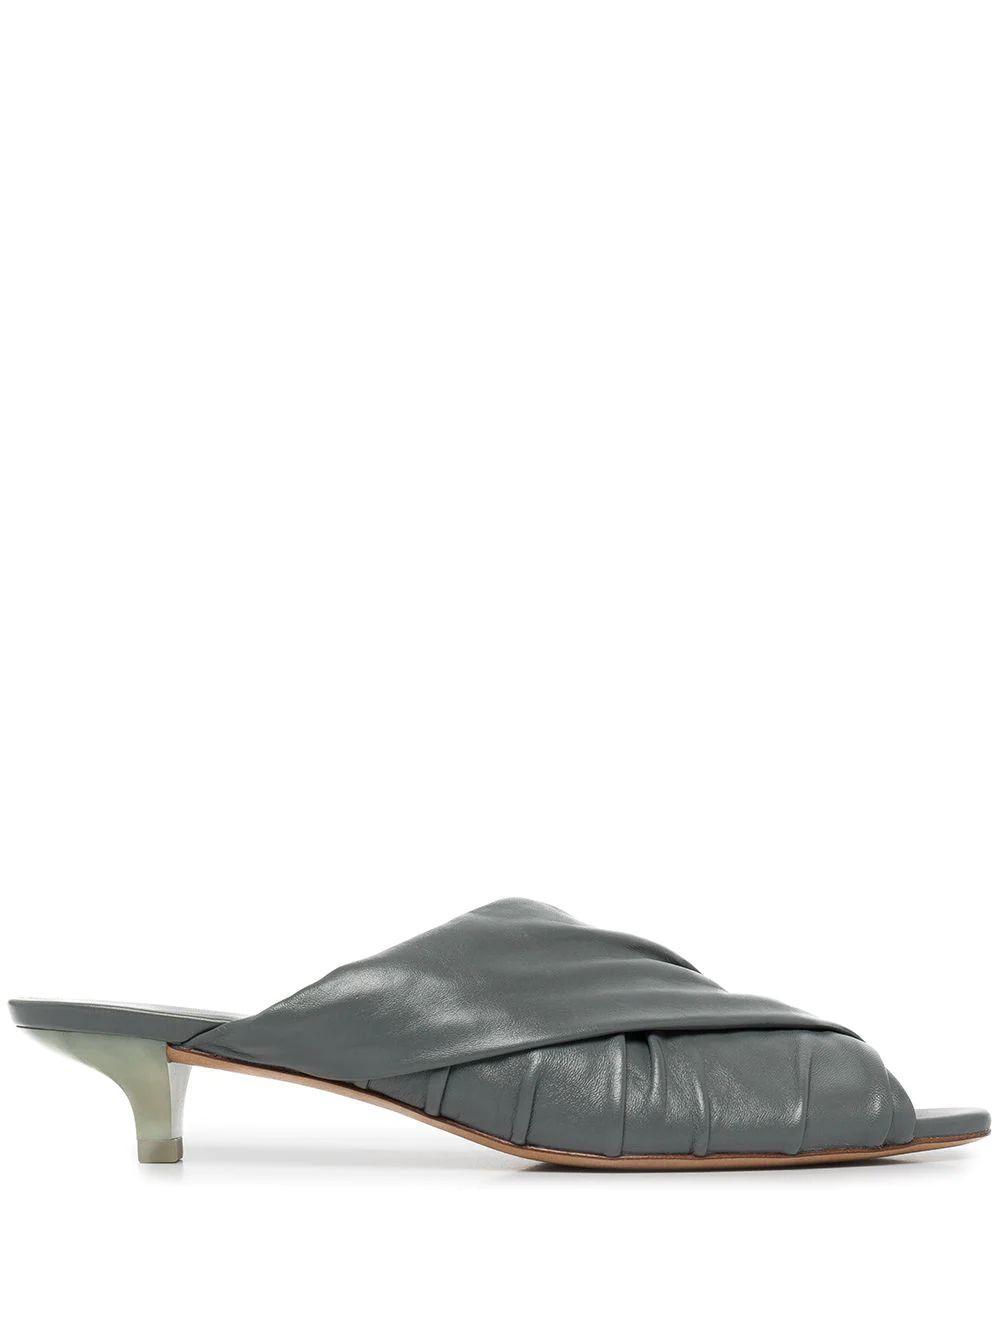 Zoey Suede Shimmer Block Heel Sandal